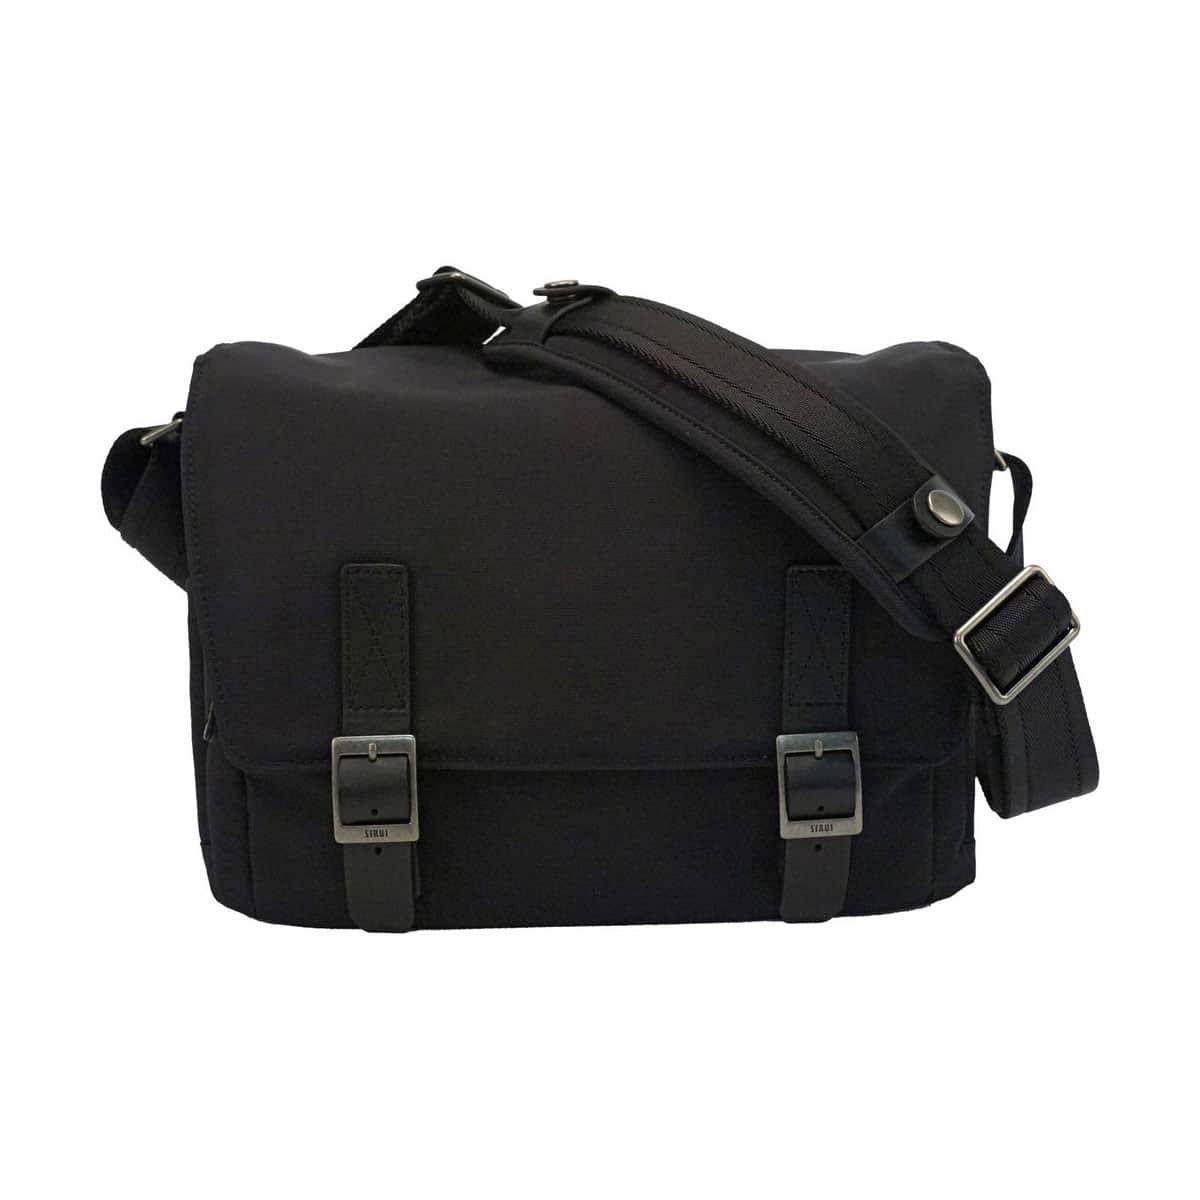 Sirui Bag My Story 11 Black